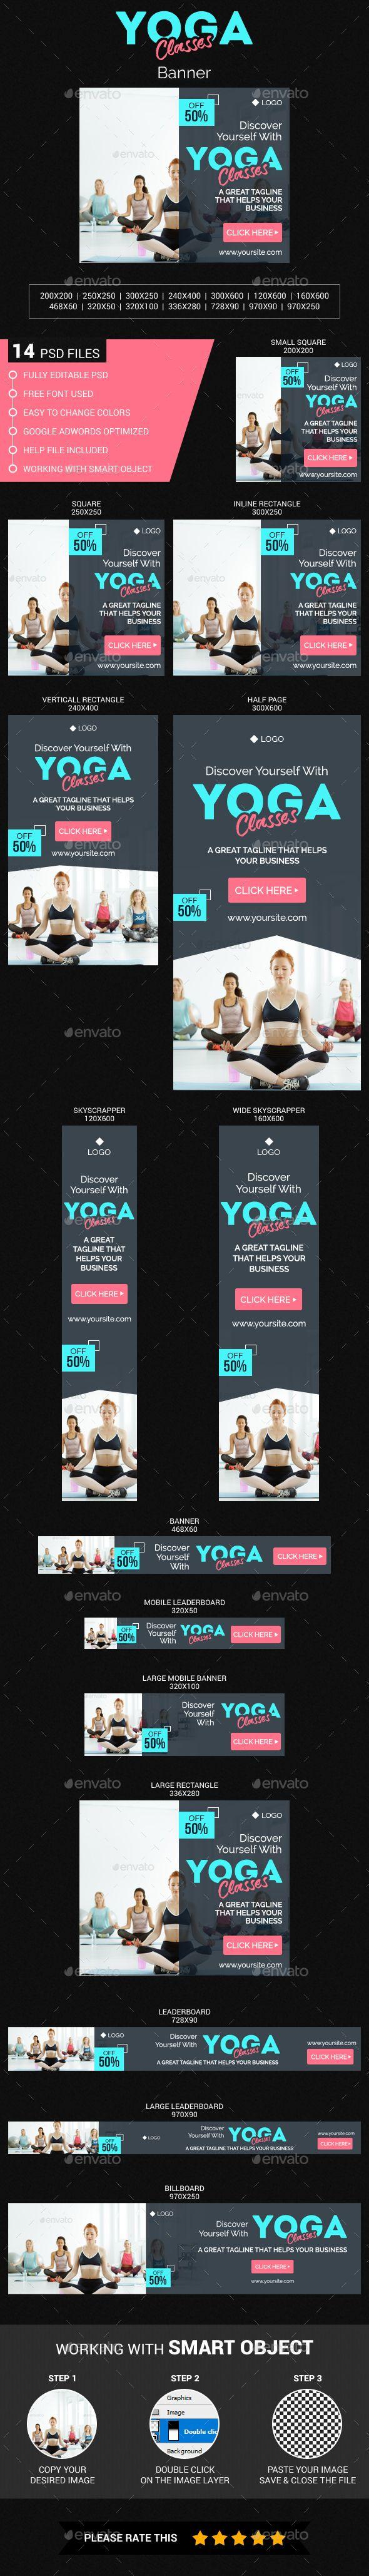 Yoga Classes Banner Banner Ads Banner Yoga Class